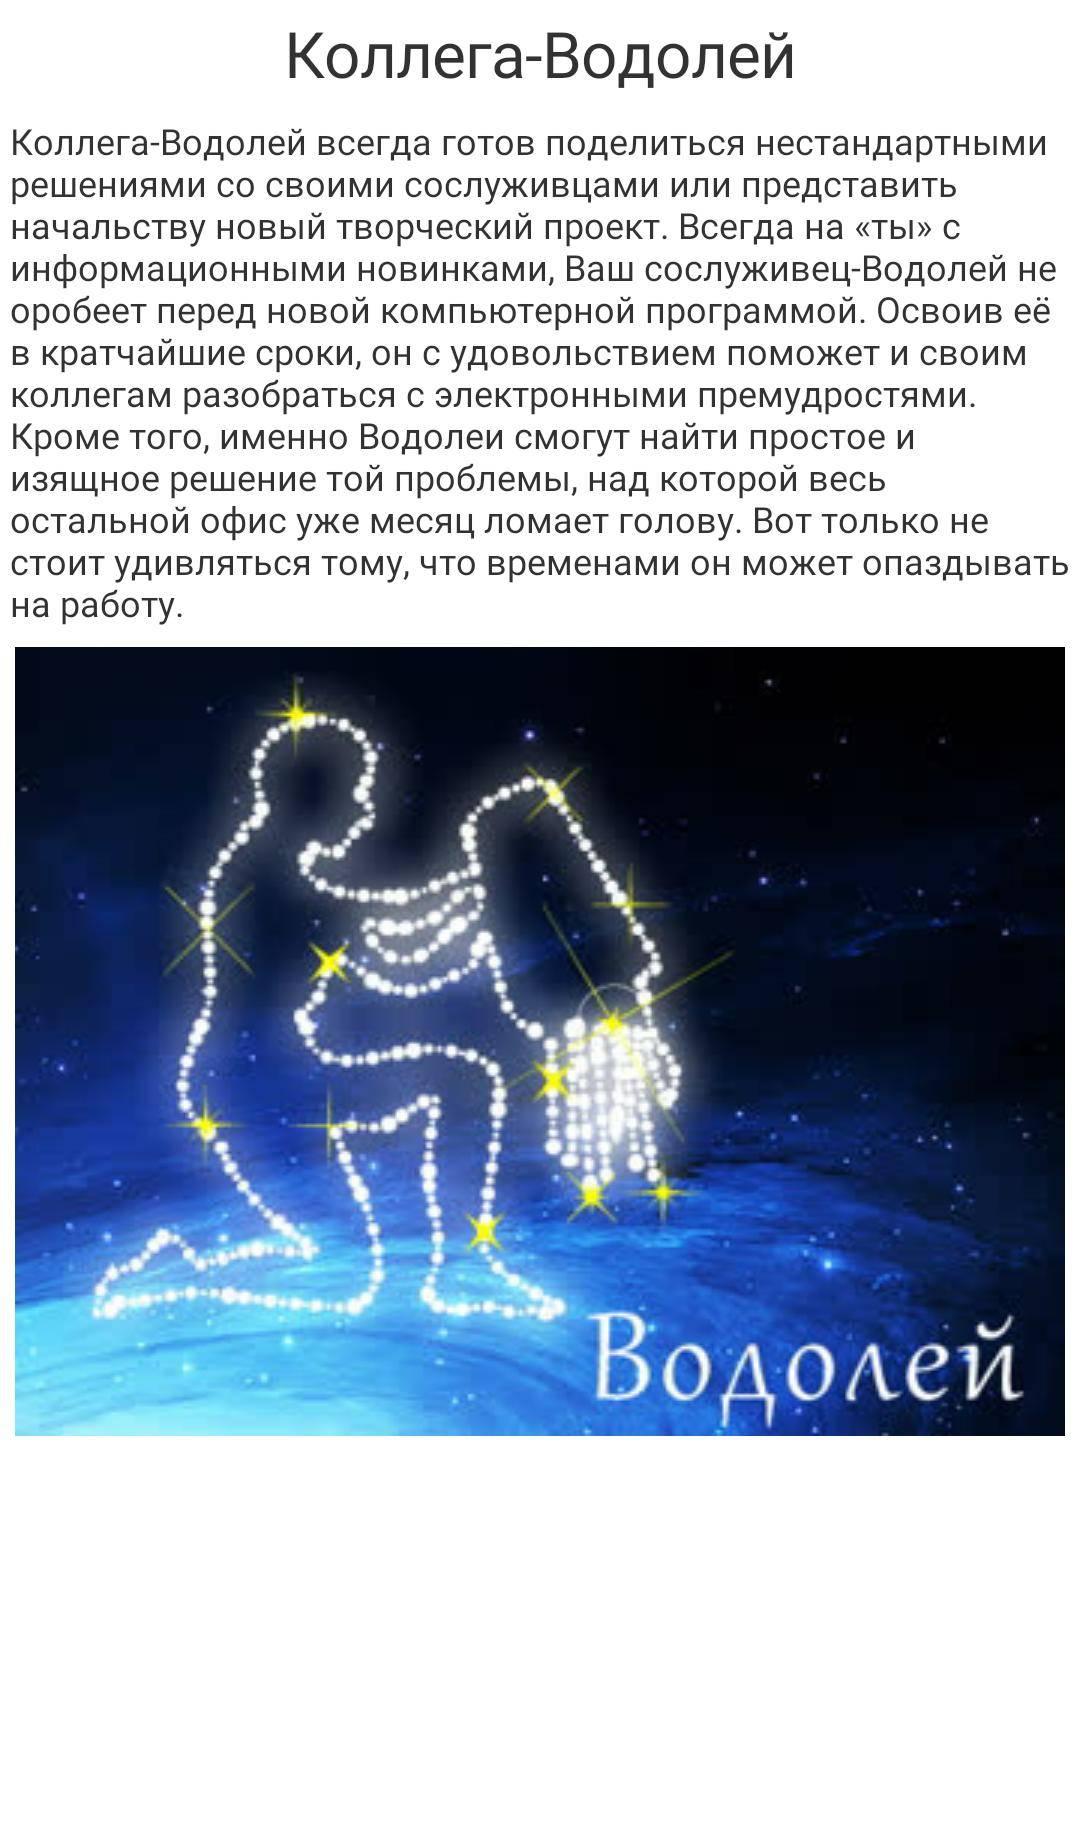 Мужчина водолей: характеристика по знаку зодиака, гороскоп парня, характер и какие девушки нравятся